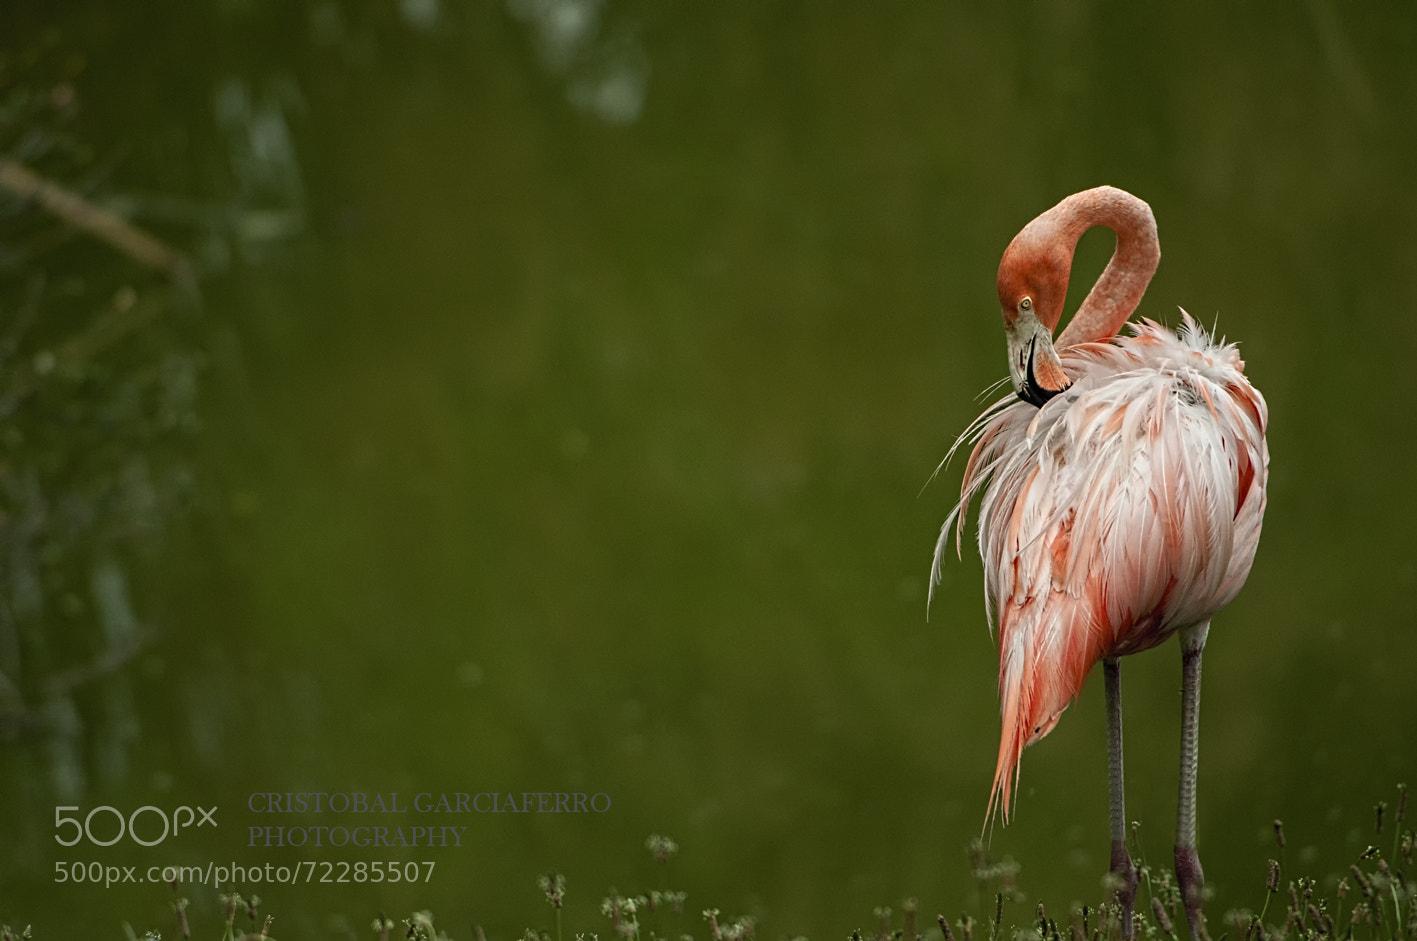 Photograph Flamingo by Cristobal Garciaferro Rubio on 500px